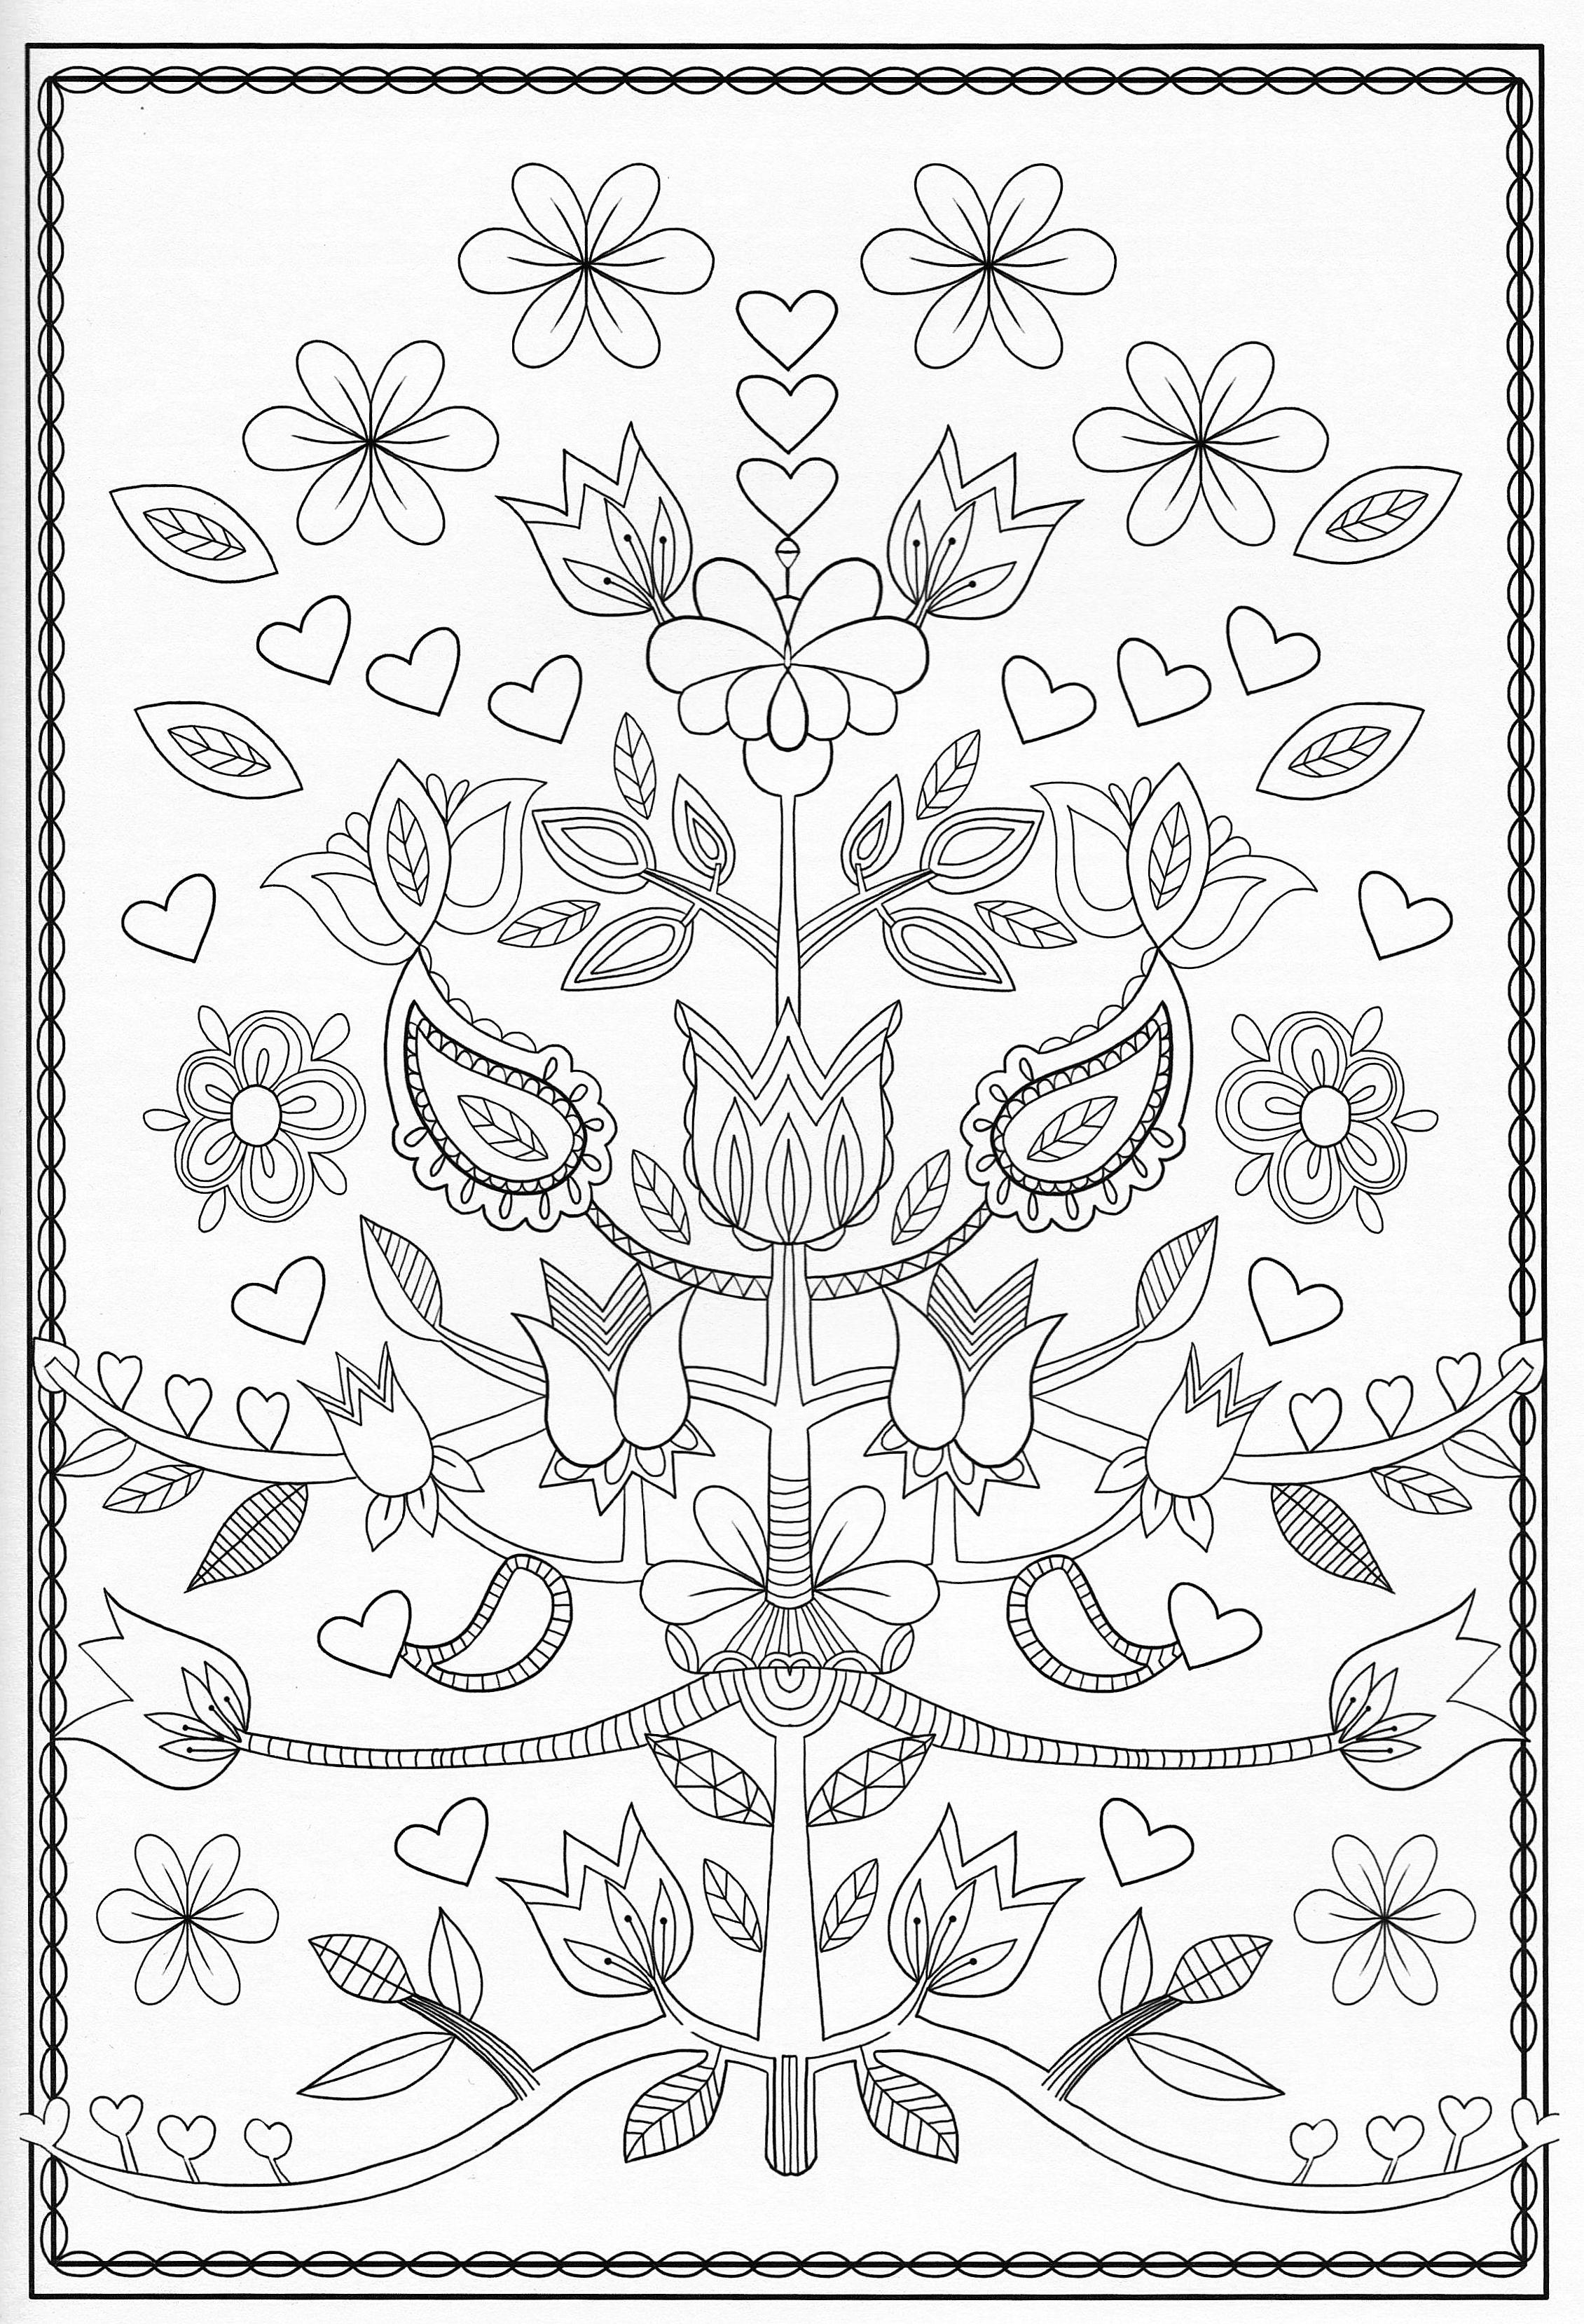 Scandinavian Coloring Book Pg 51 | Color Pages, Stencils